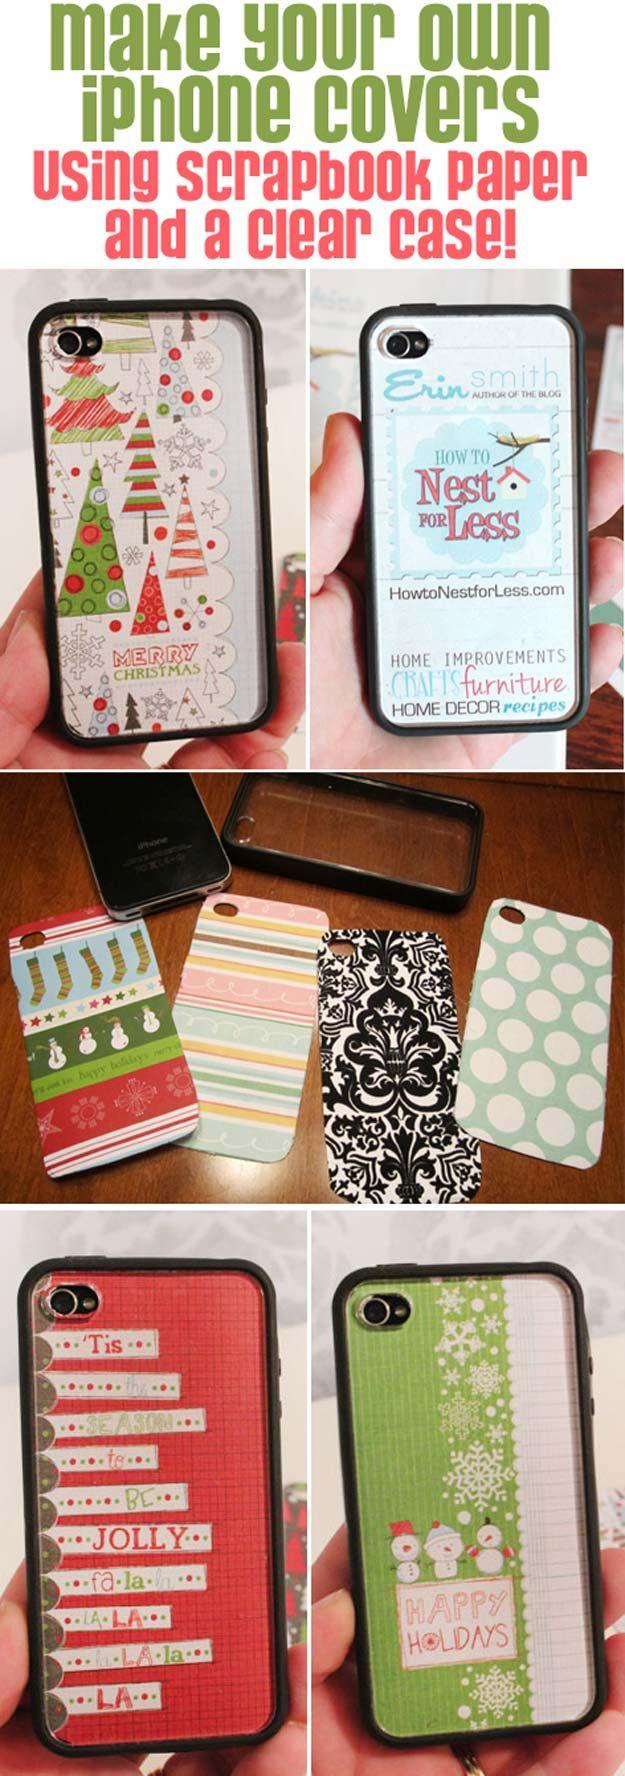 Scrapbook paper case - Diy Iphone Case Makeovers Scrapbook Paper Iphone Case Easy Diy Projects And Handmade Crafts